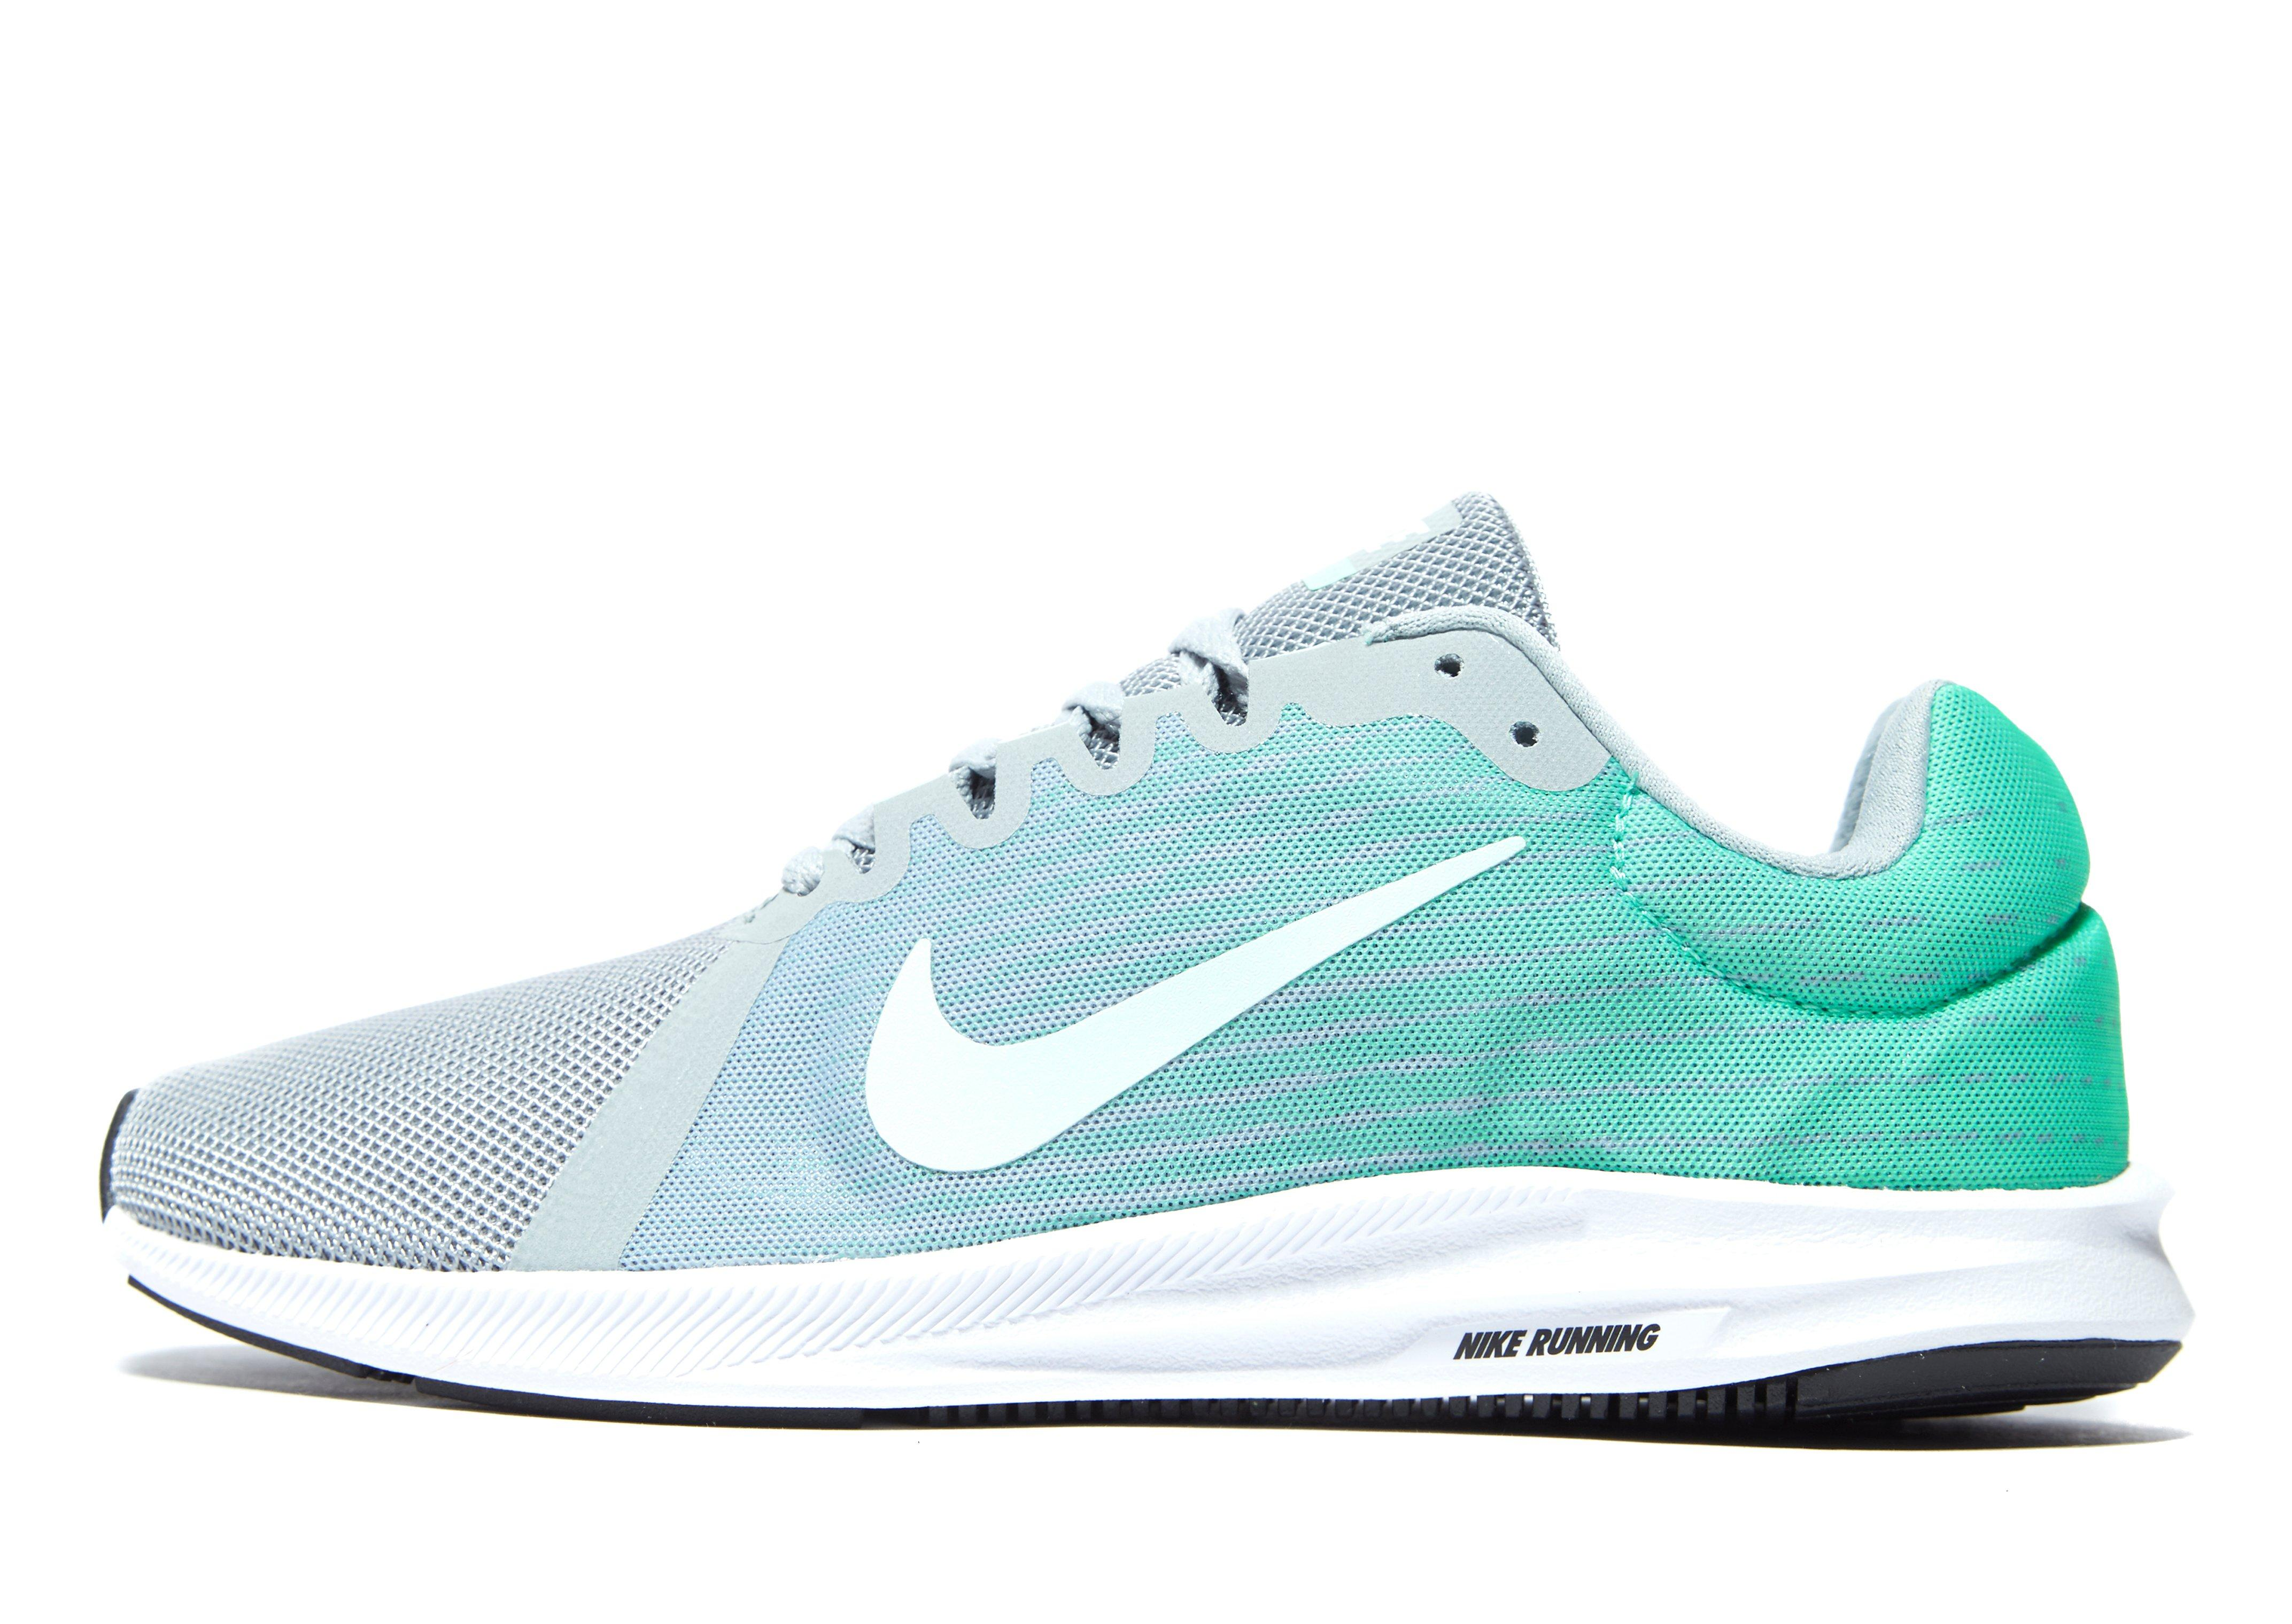 625dd9e82f2b Nike Vapormax Oreo Casual Mens Shoe